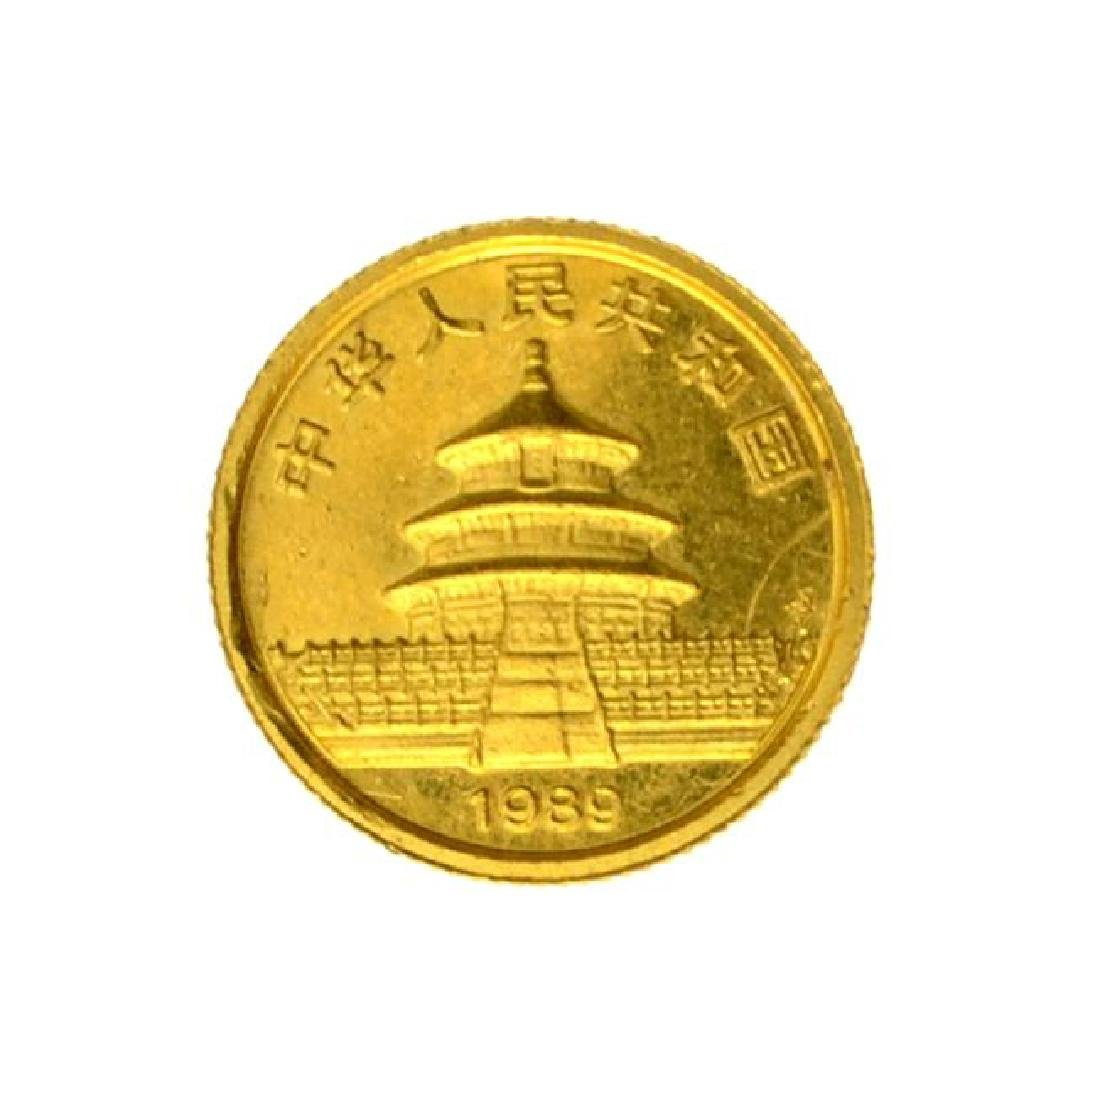 1989 1/20th Small Date Gold Panda 5 Yuan MS Coin JGPS